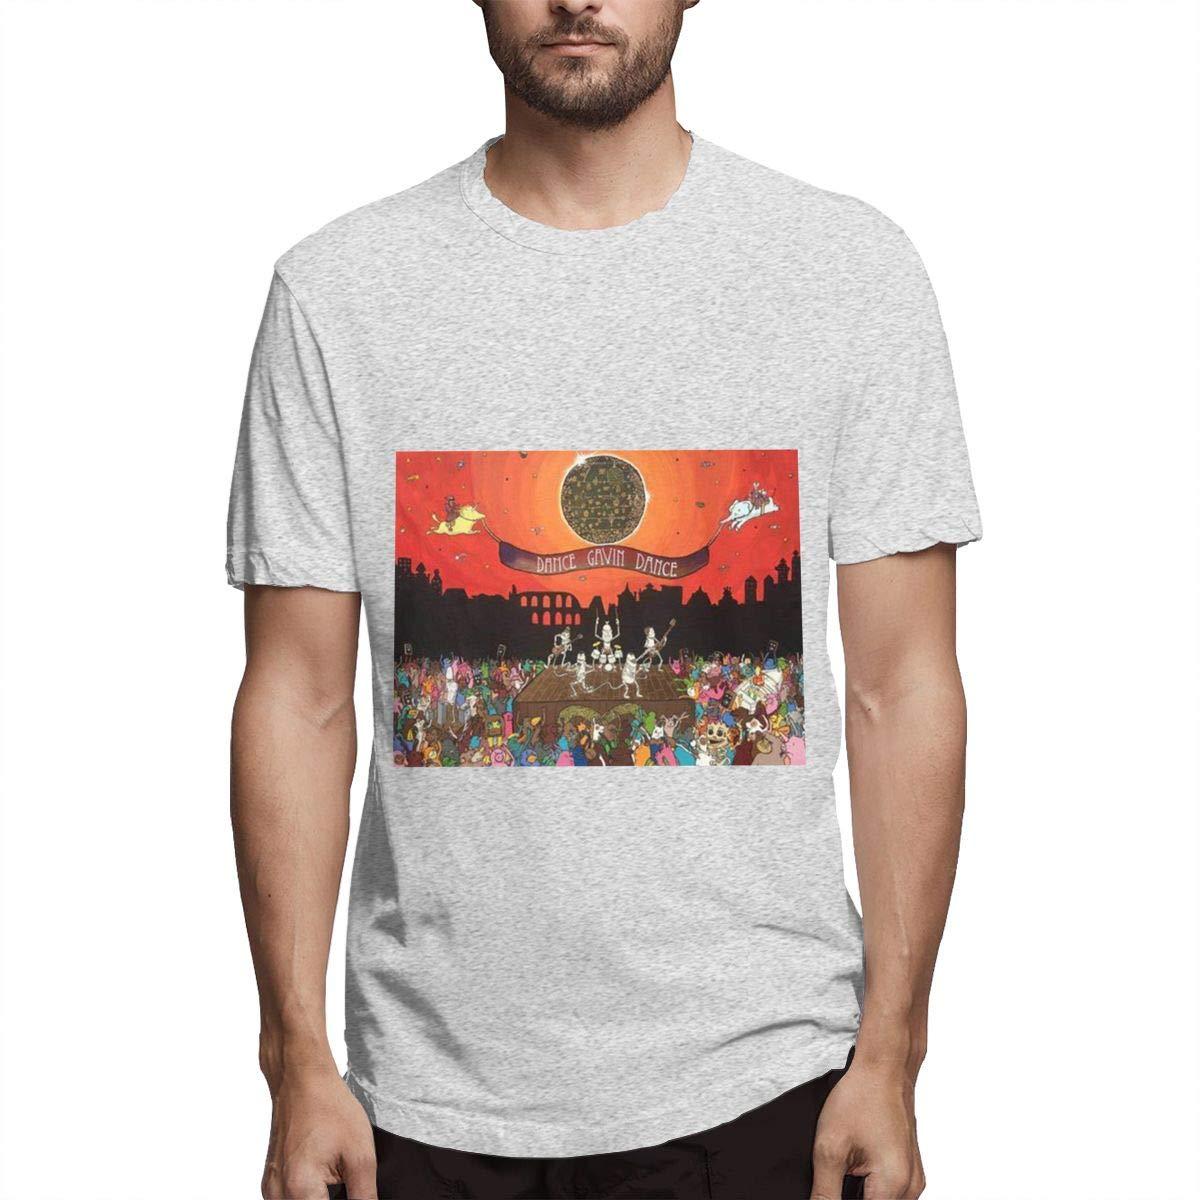 Lihehen Gavin Dance Fashion Leisure Round Neck Tees Shirts